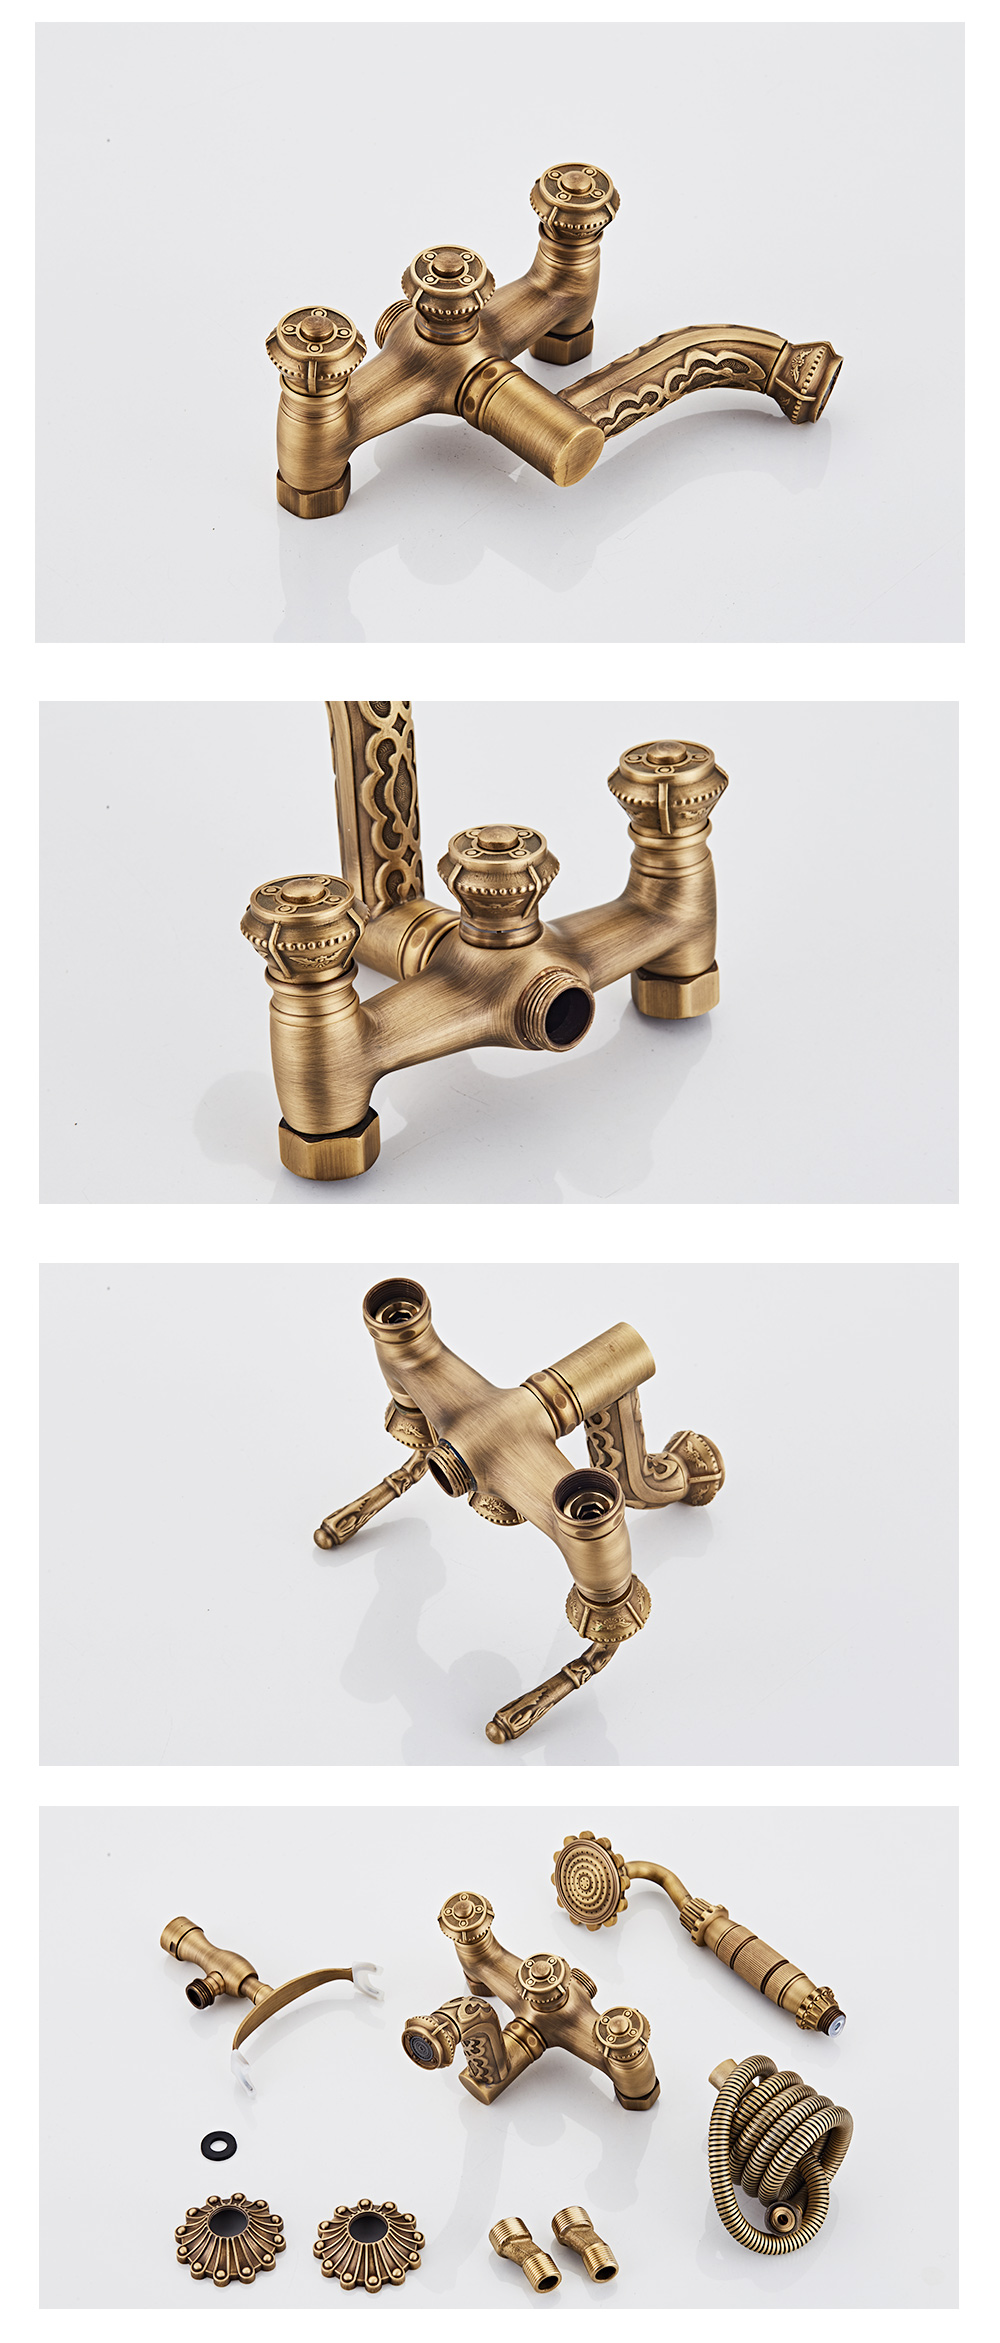 H12e17018ca0b44979846293942d080c1z Antique Bronze Bathroom Shower Faucet High Quantity Bathtub Shower Set Mixer With Hand Shower Taps Wall Mounted WB1603